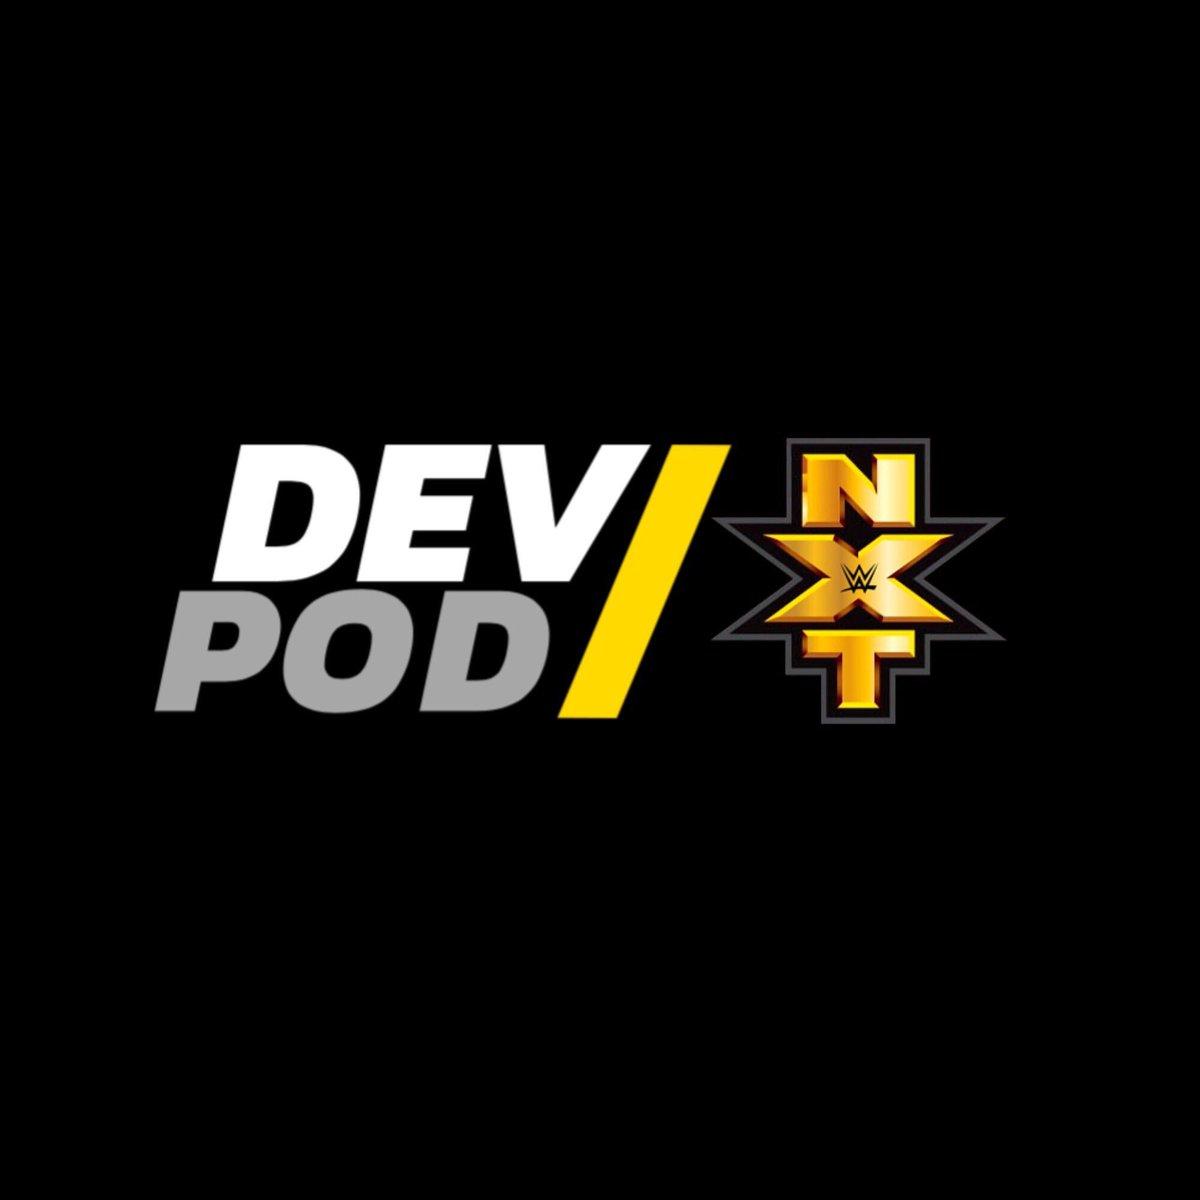 DevelopPodcast photo